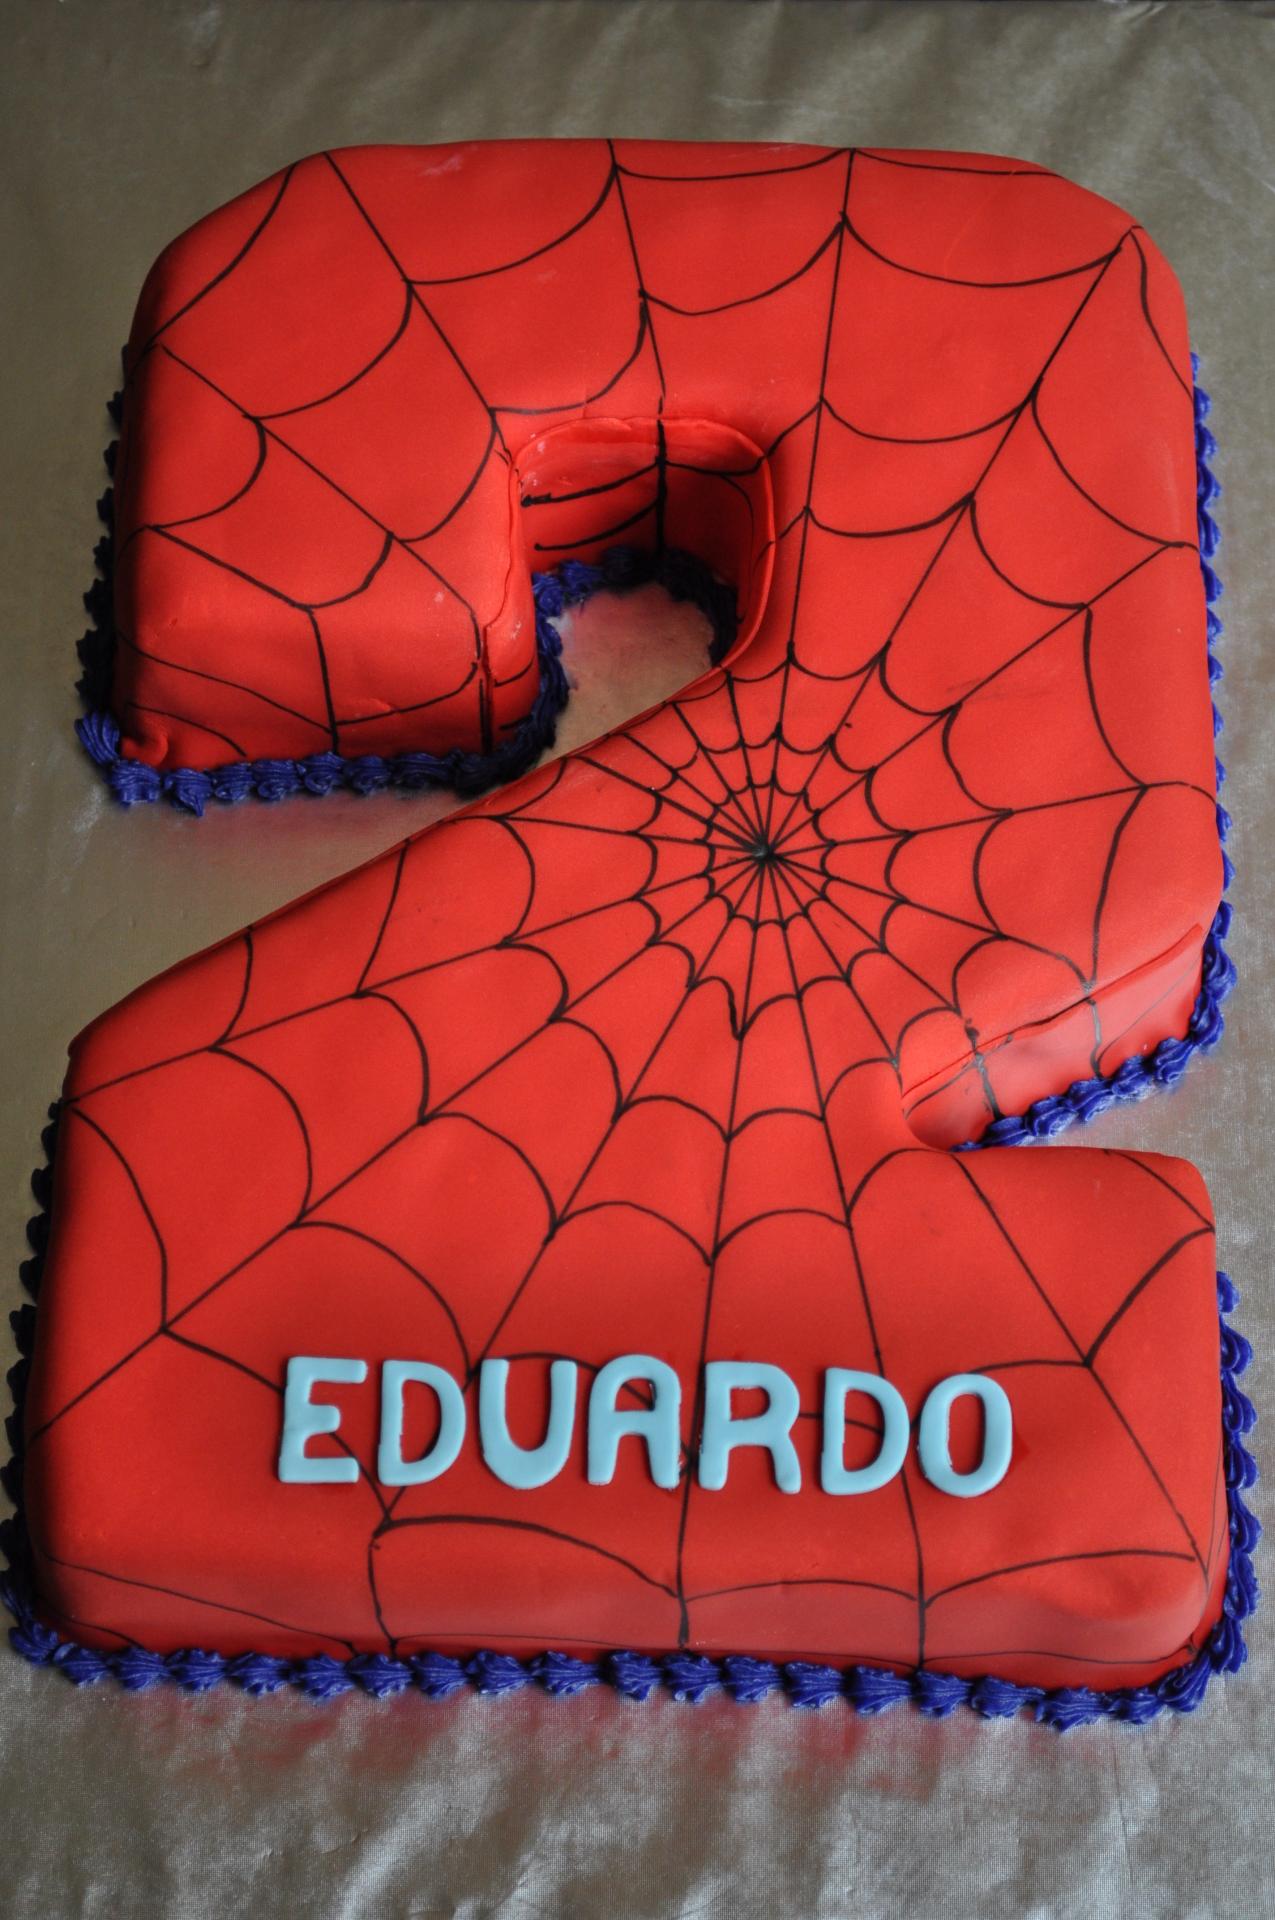 Spiderman cake, number 2 cake